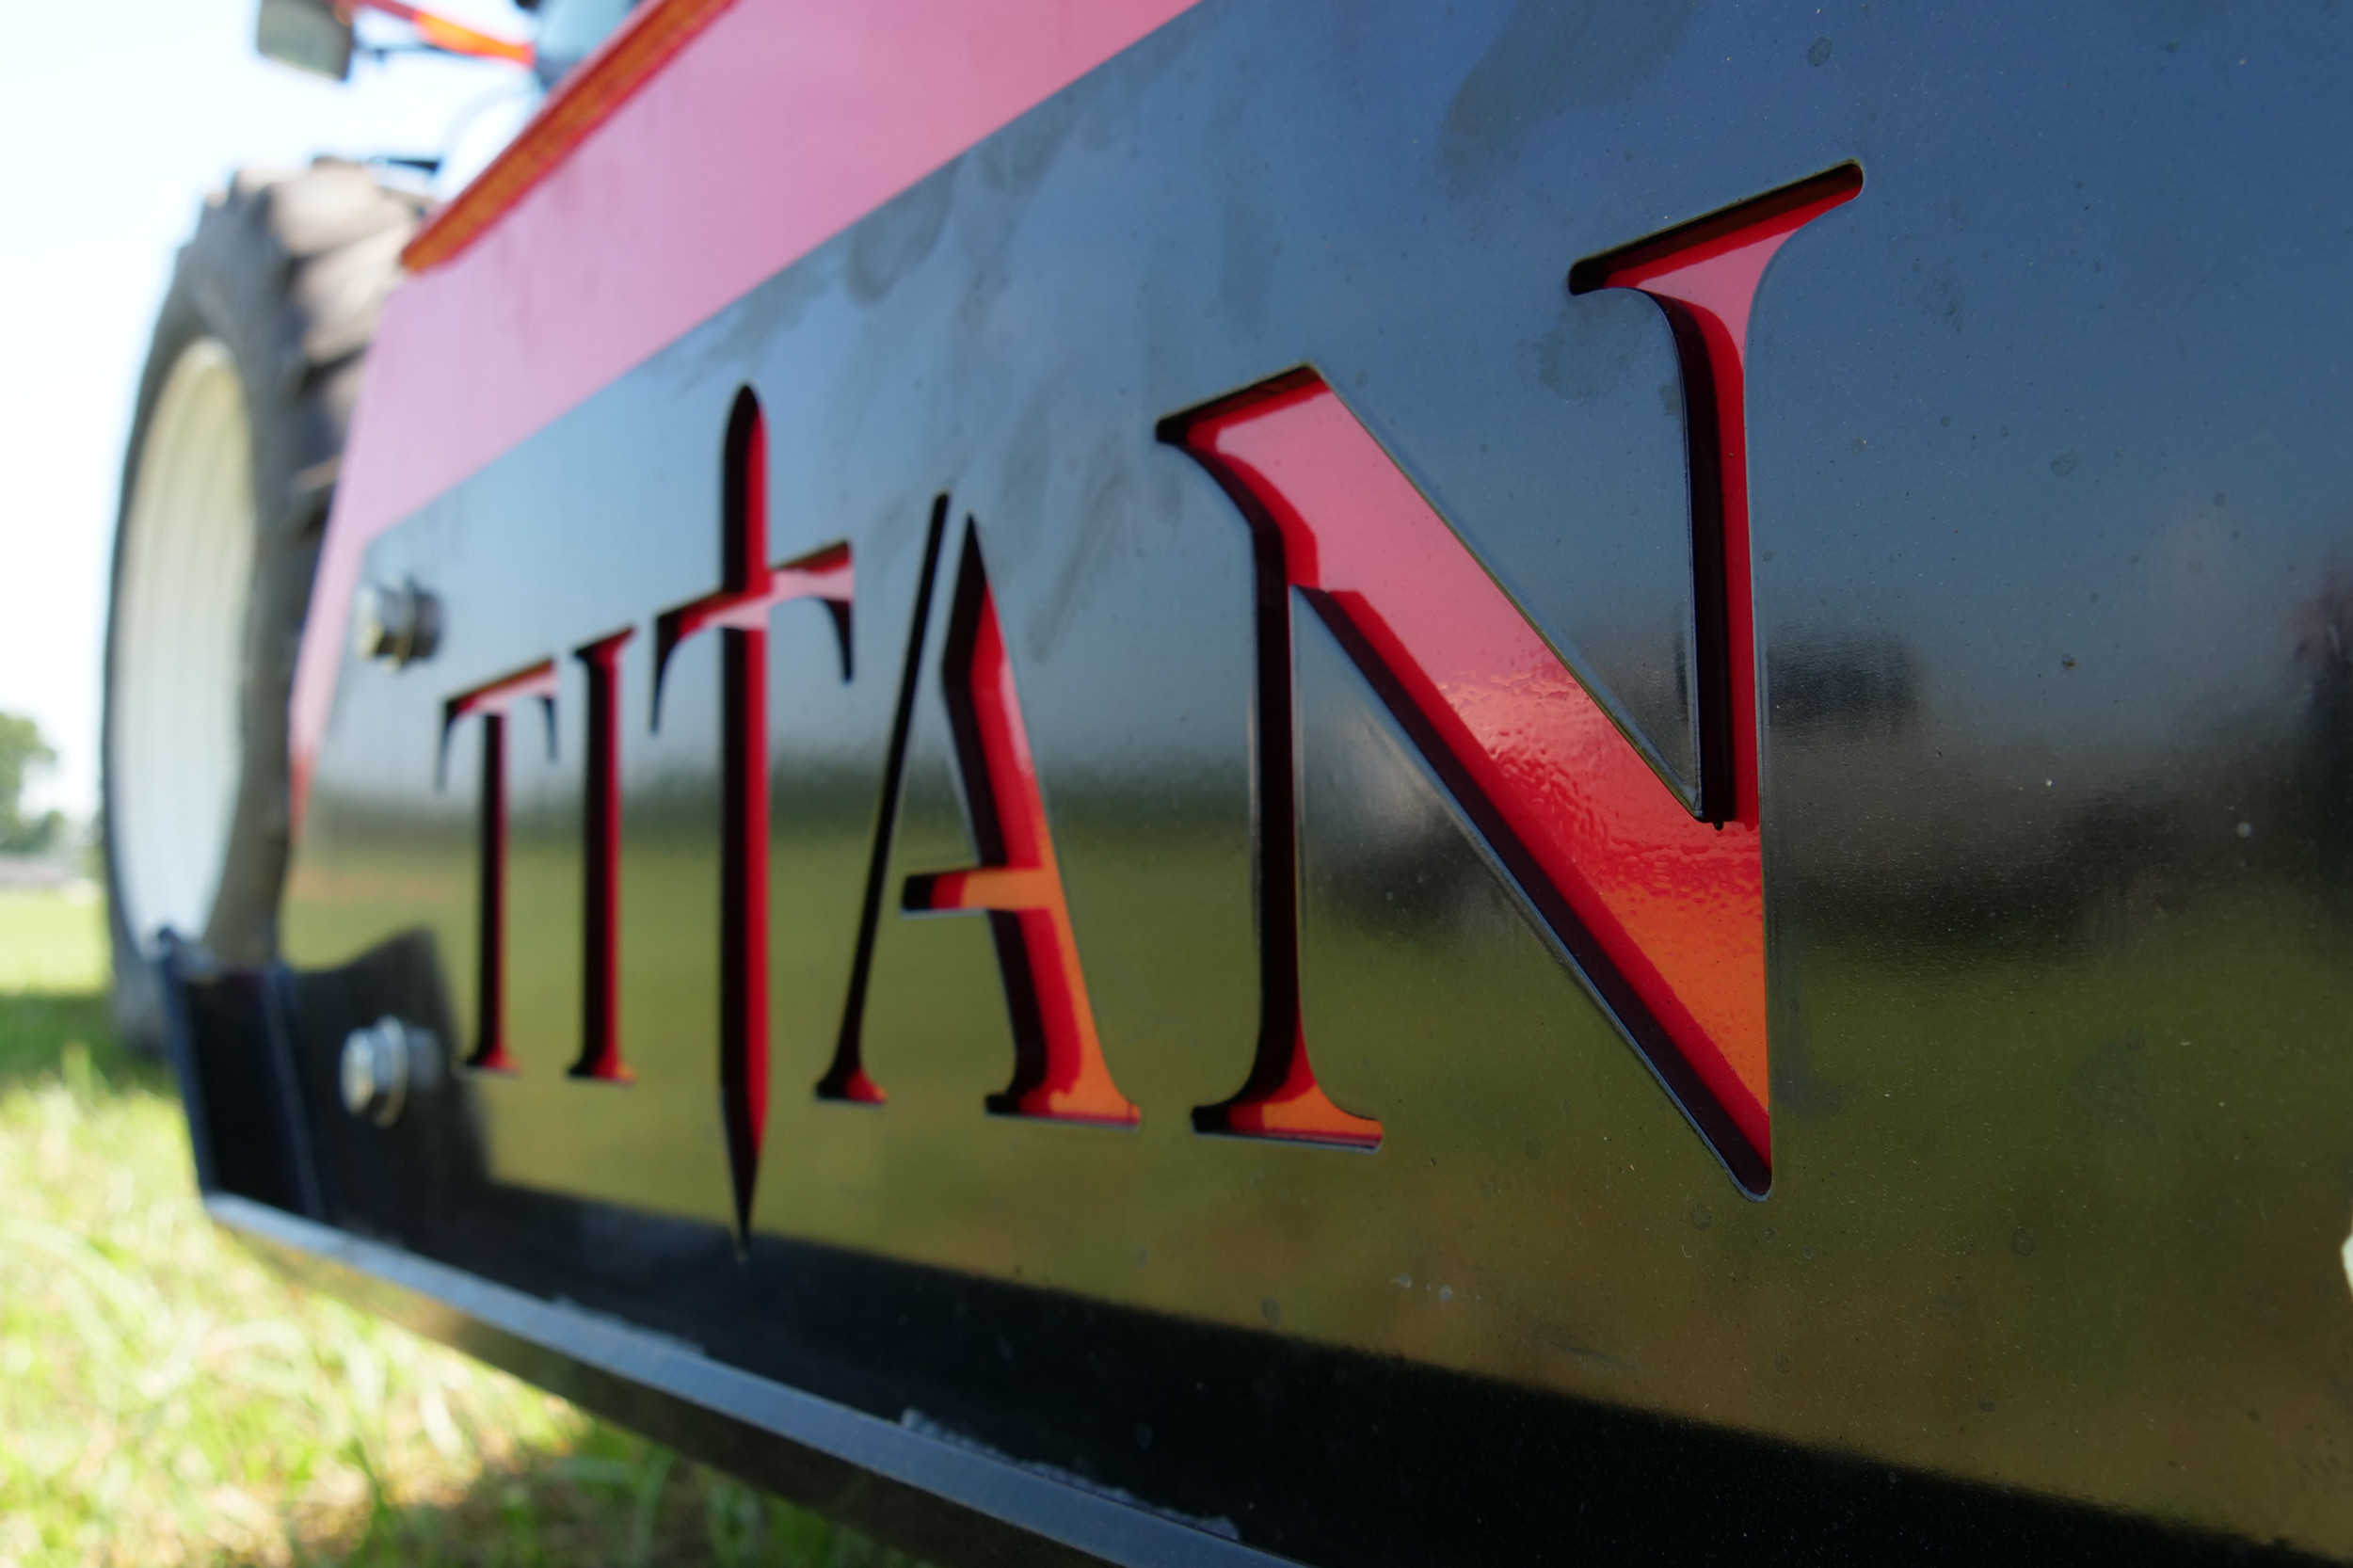 www.titanimplement.com